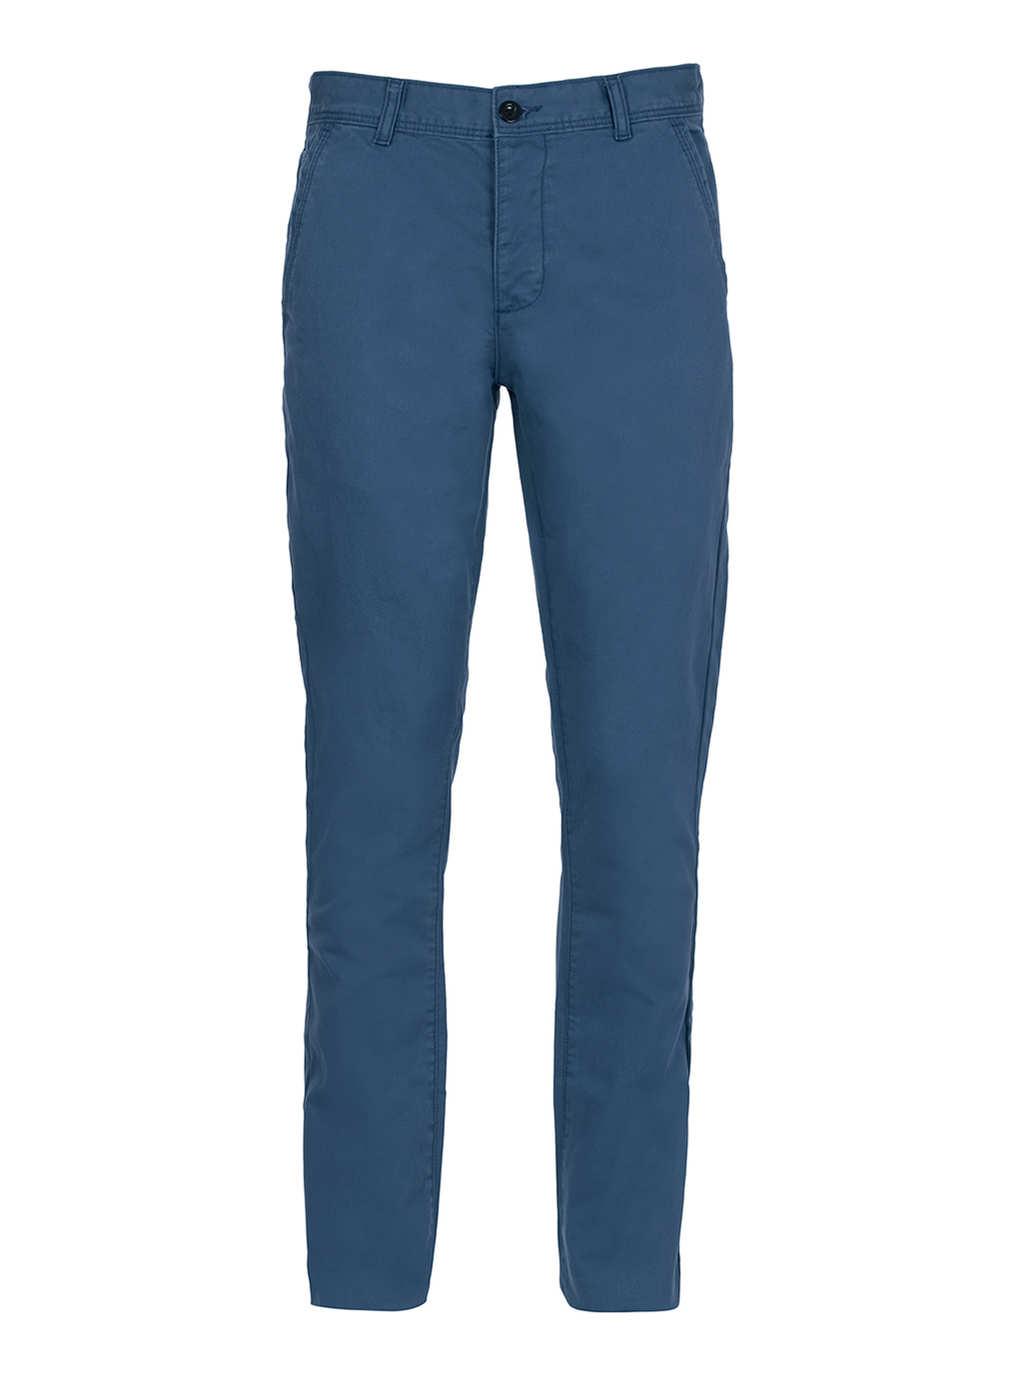 Dark Blue Vintage Slim Chinos - Men's Chinos - Clothing